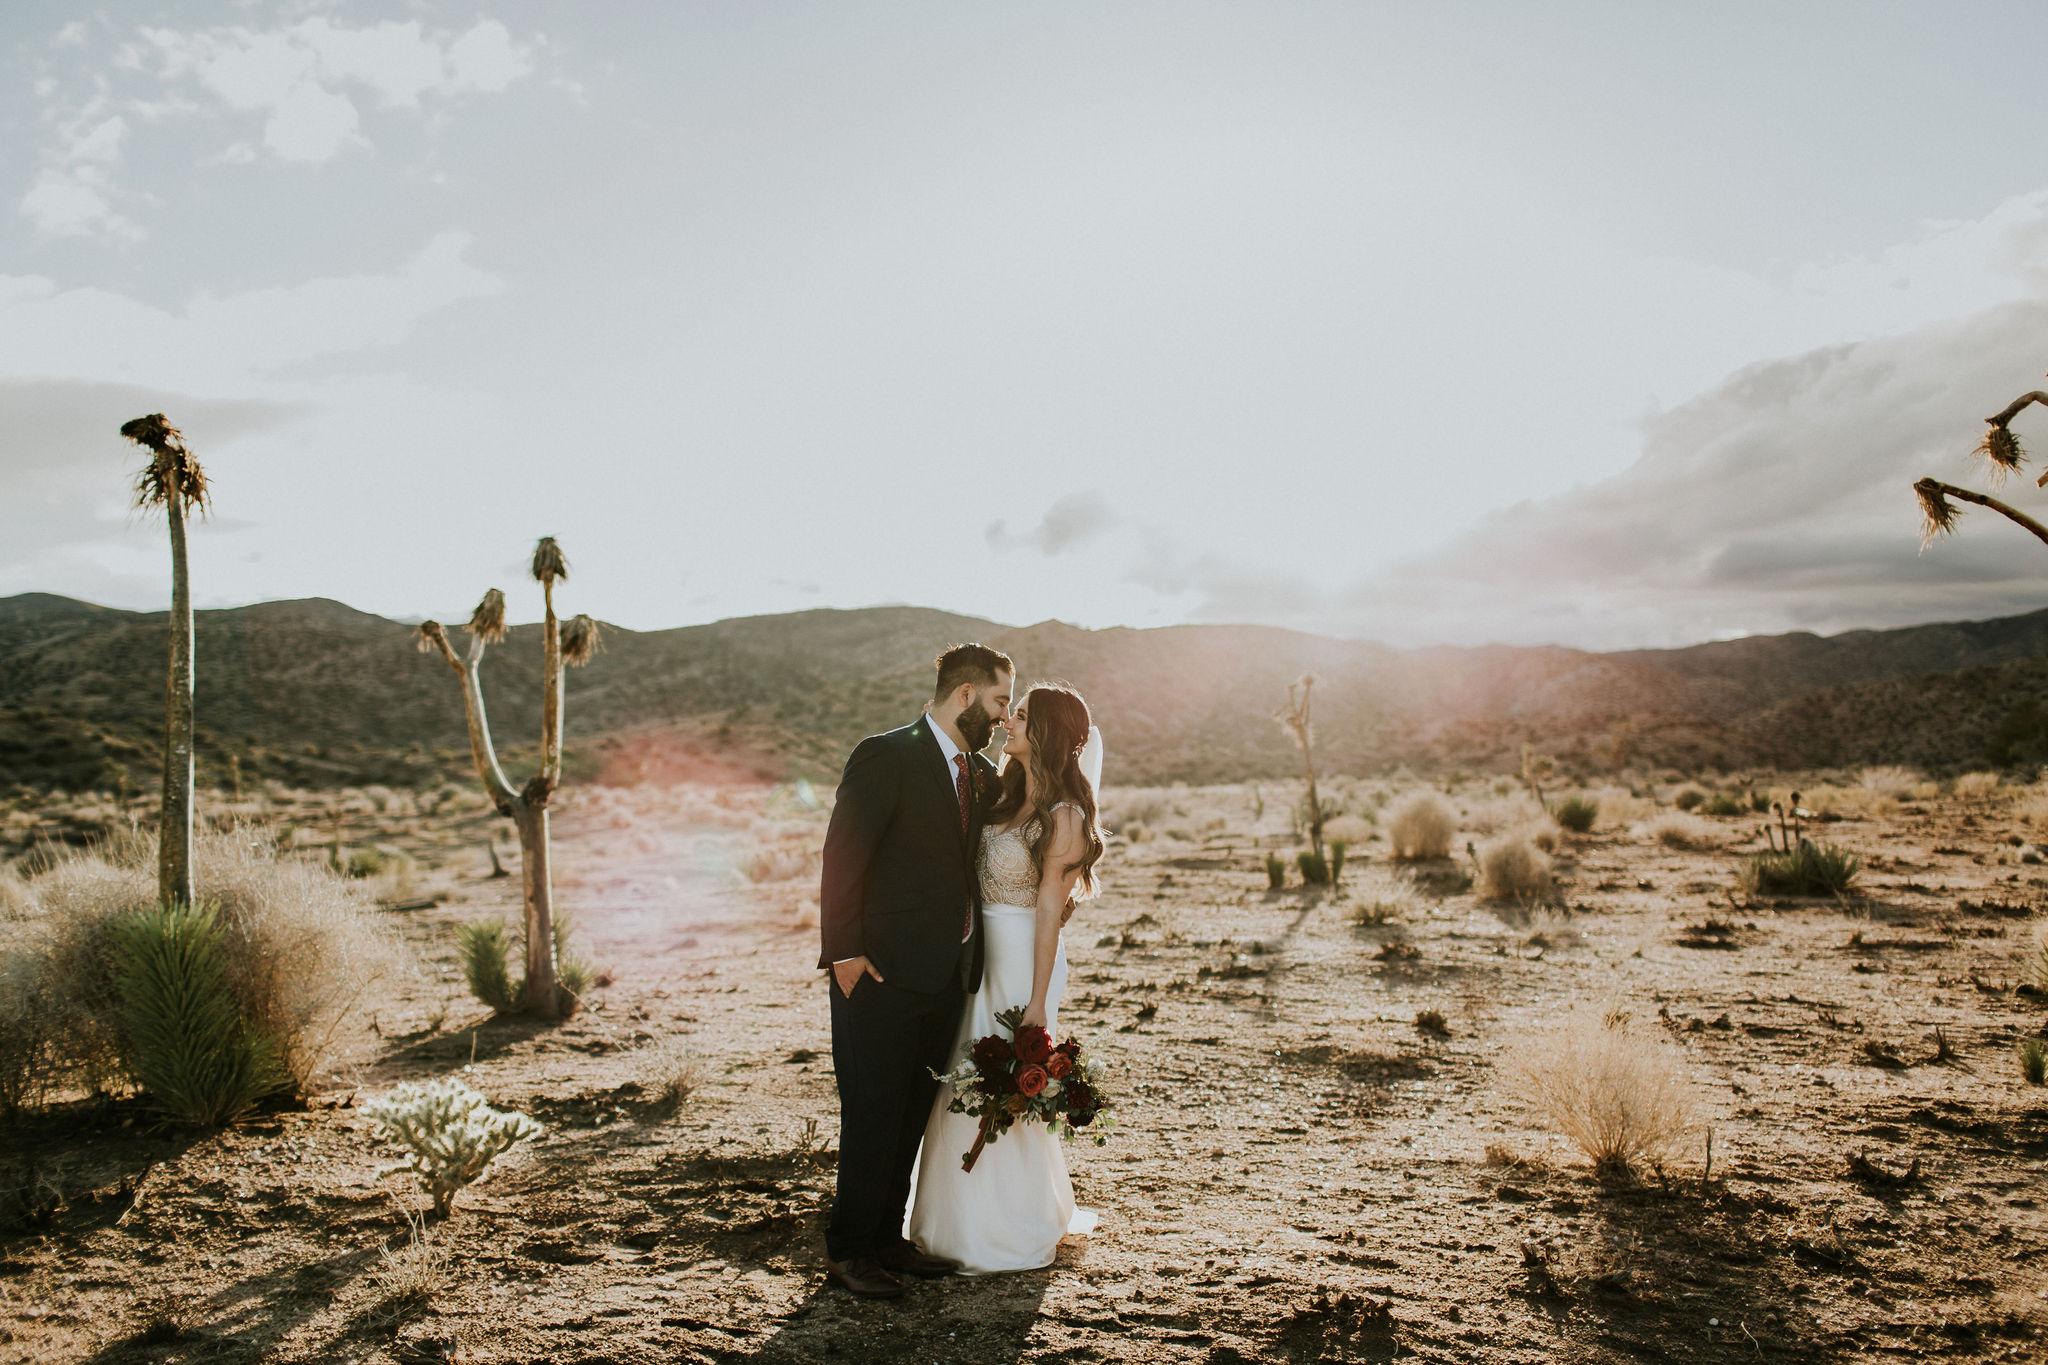 RimrockRanch-JoshuaTree-Wedding-Jami-Laree-622.jpg